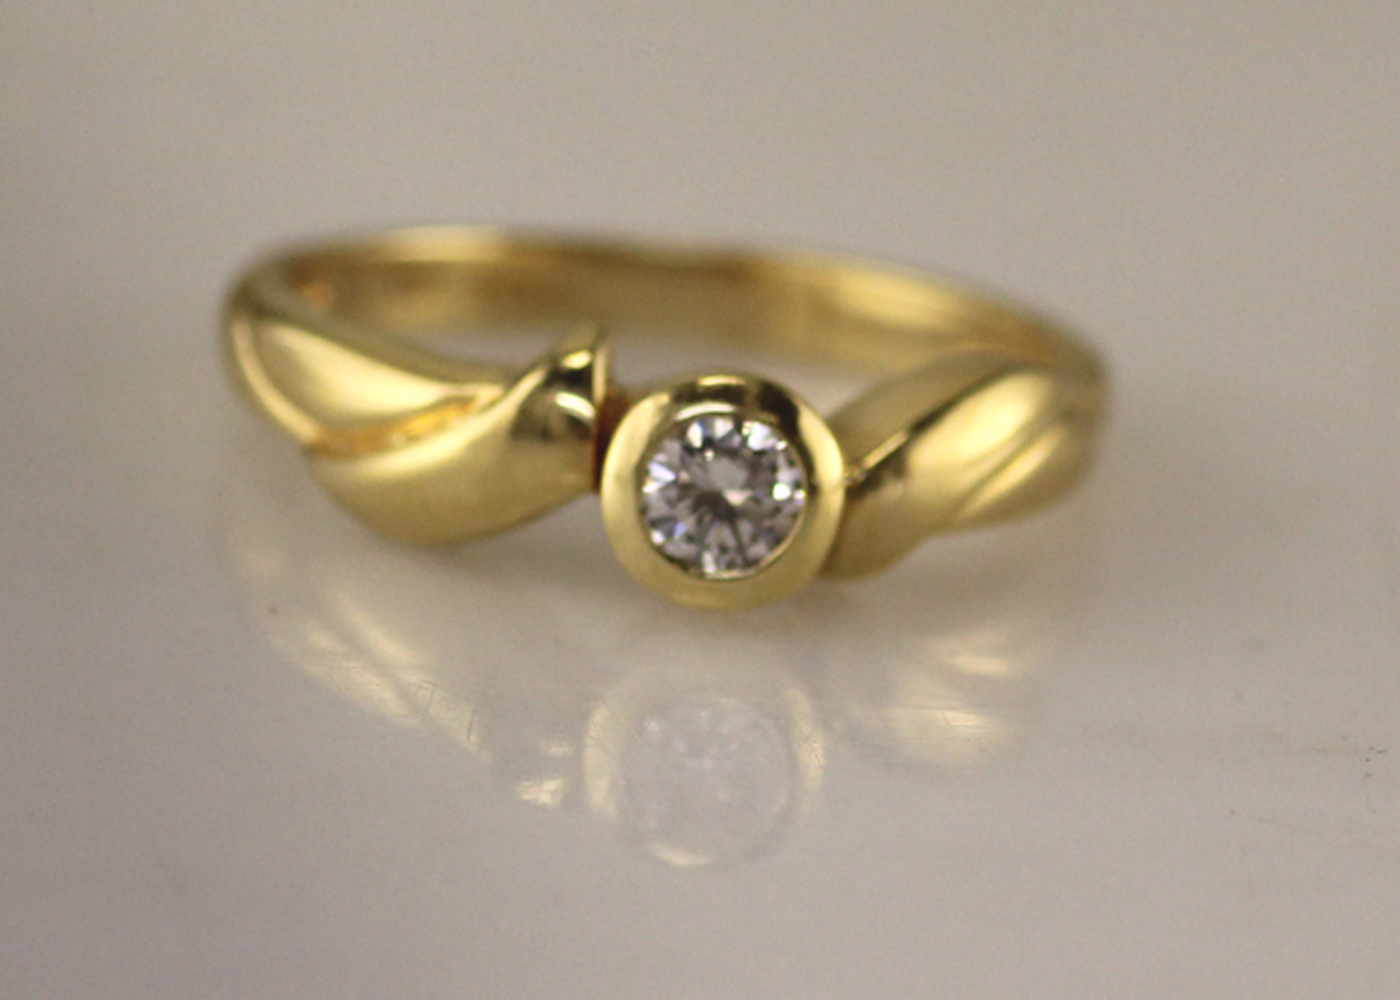 18ct Rub Over Set Diamond Ring 0.17 Carats - Image 7 of 7